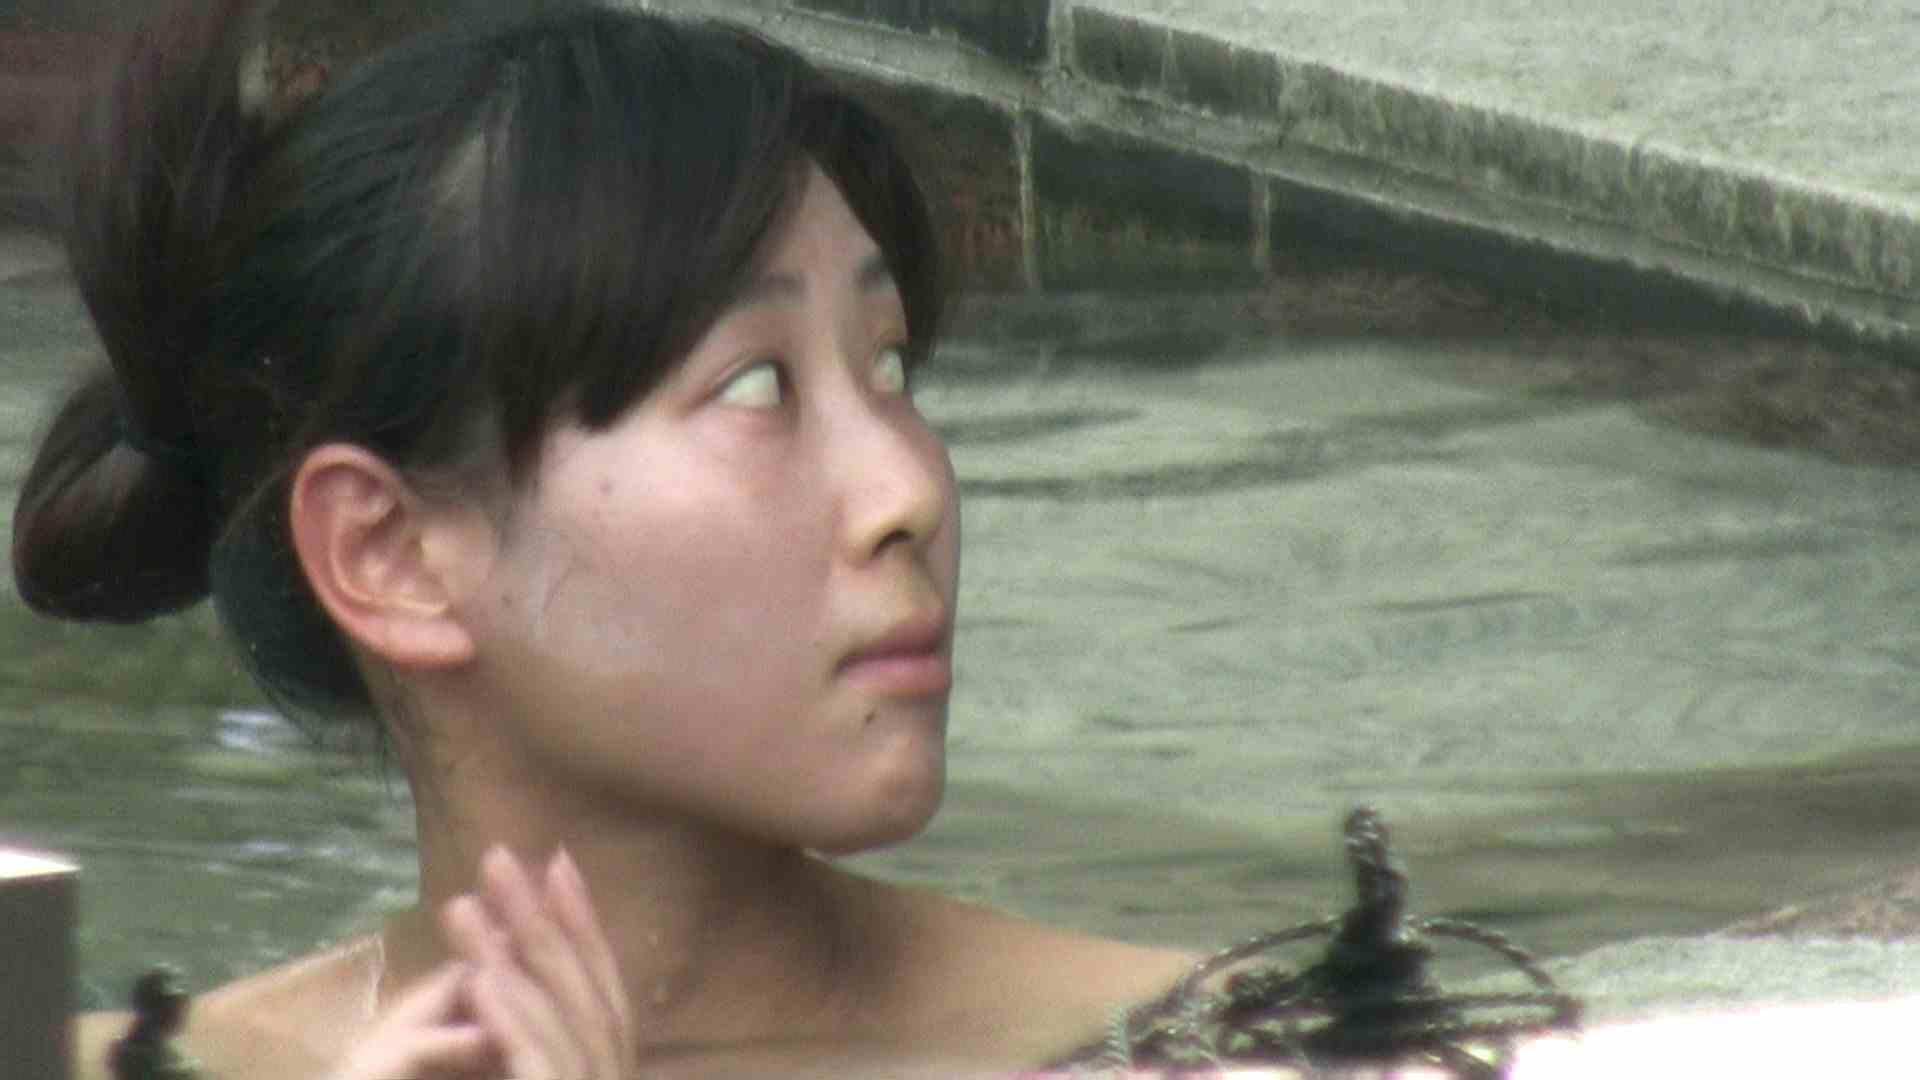 Aquaな露天風呂Vol.665 HなOL   盗撮  104pic 16